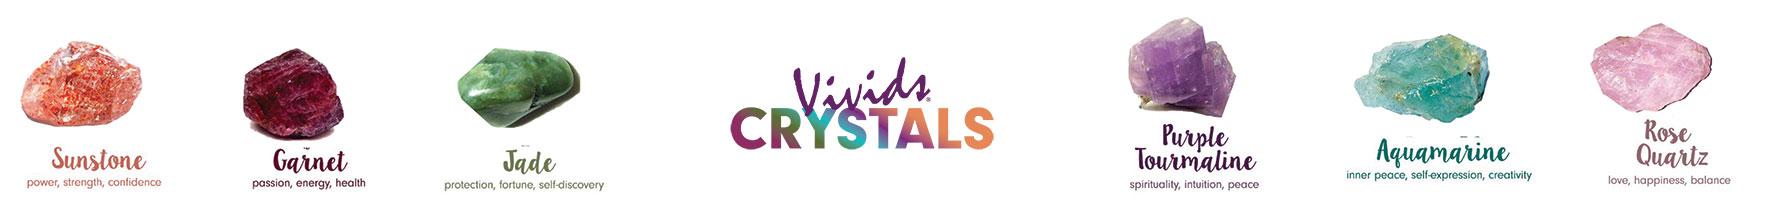 Pravana Vivids Crystals Pravana Australia Official Supplier Since